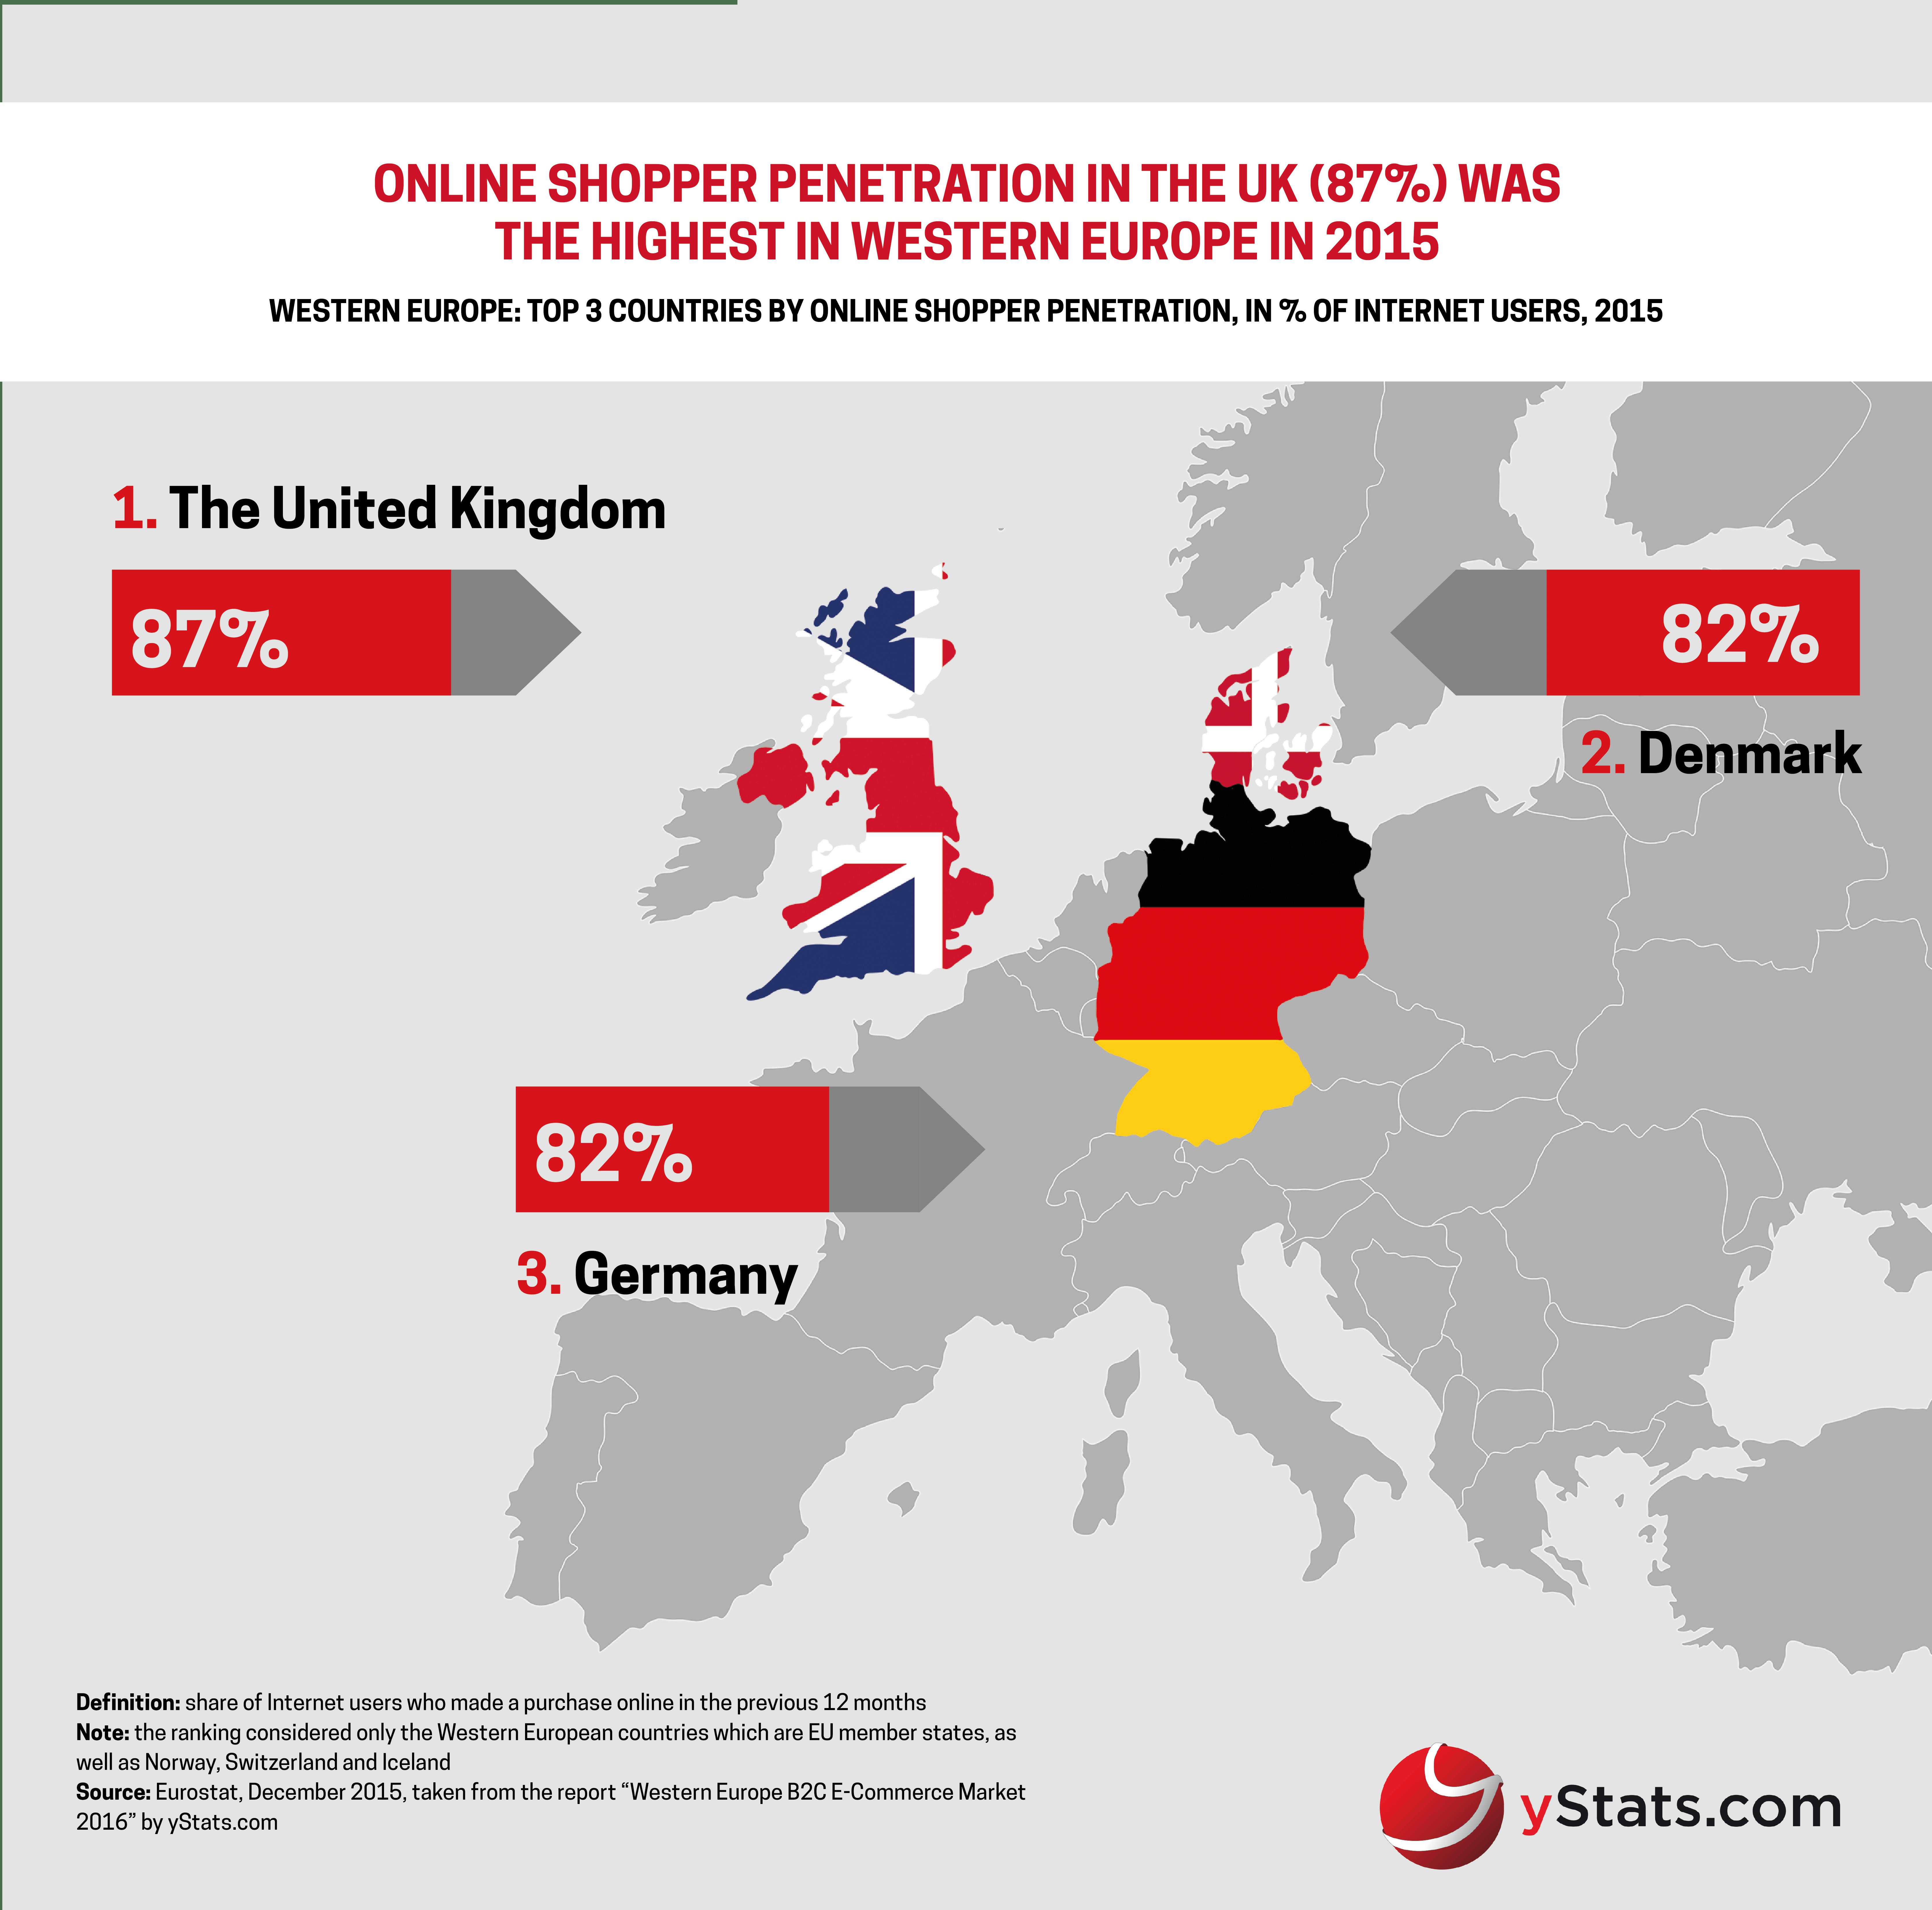 E Commerce Site Map: YStats.com Infographic Western Europe B2C E-Commerce Market 2016